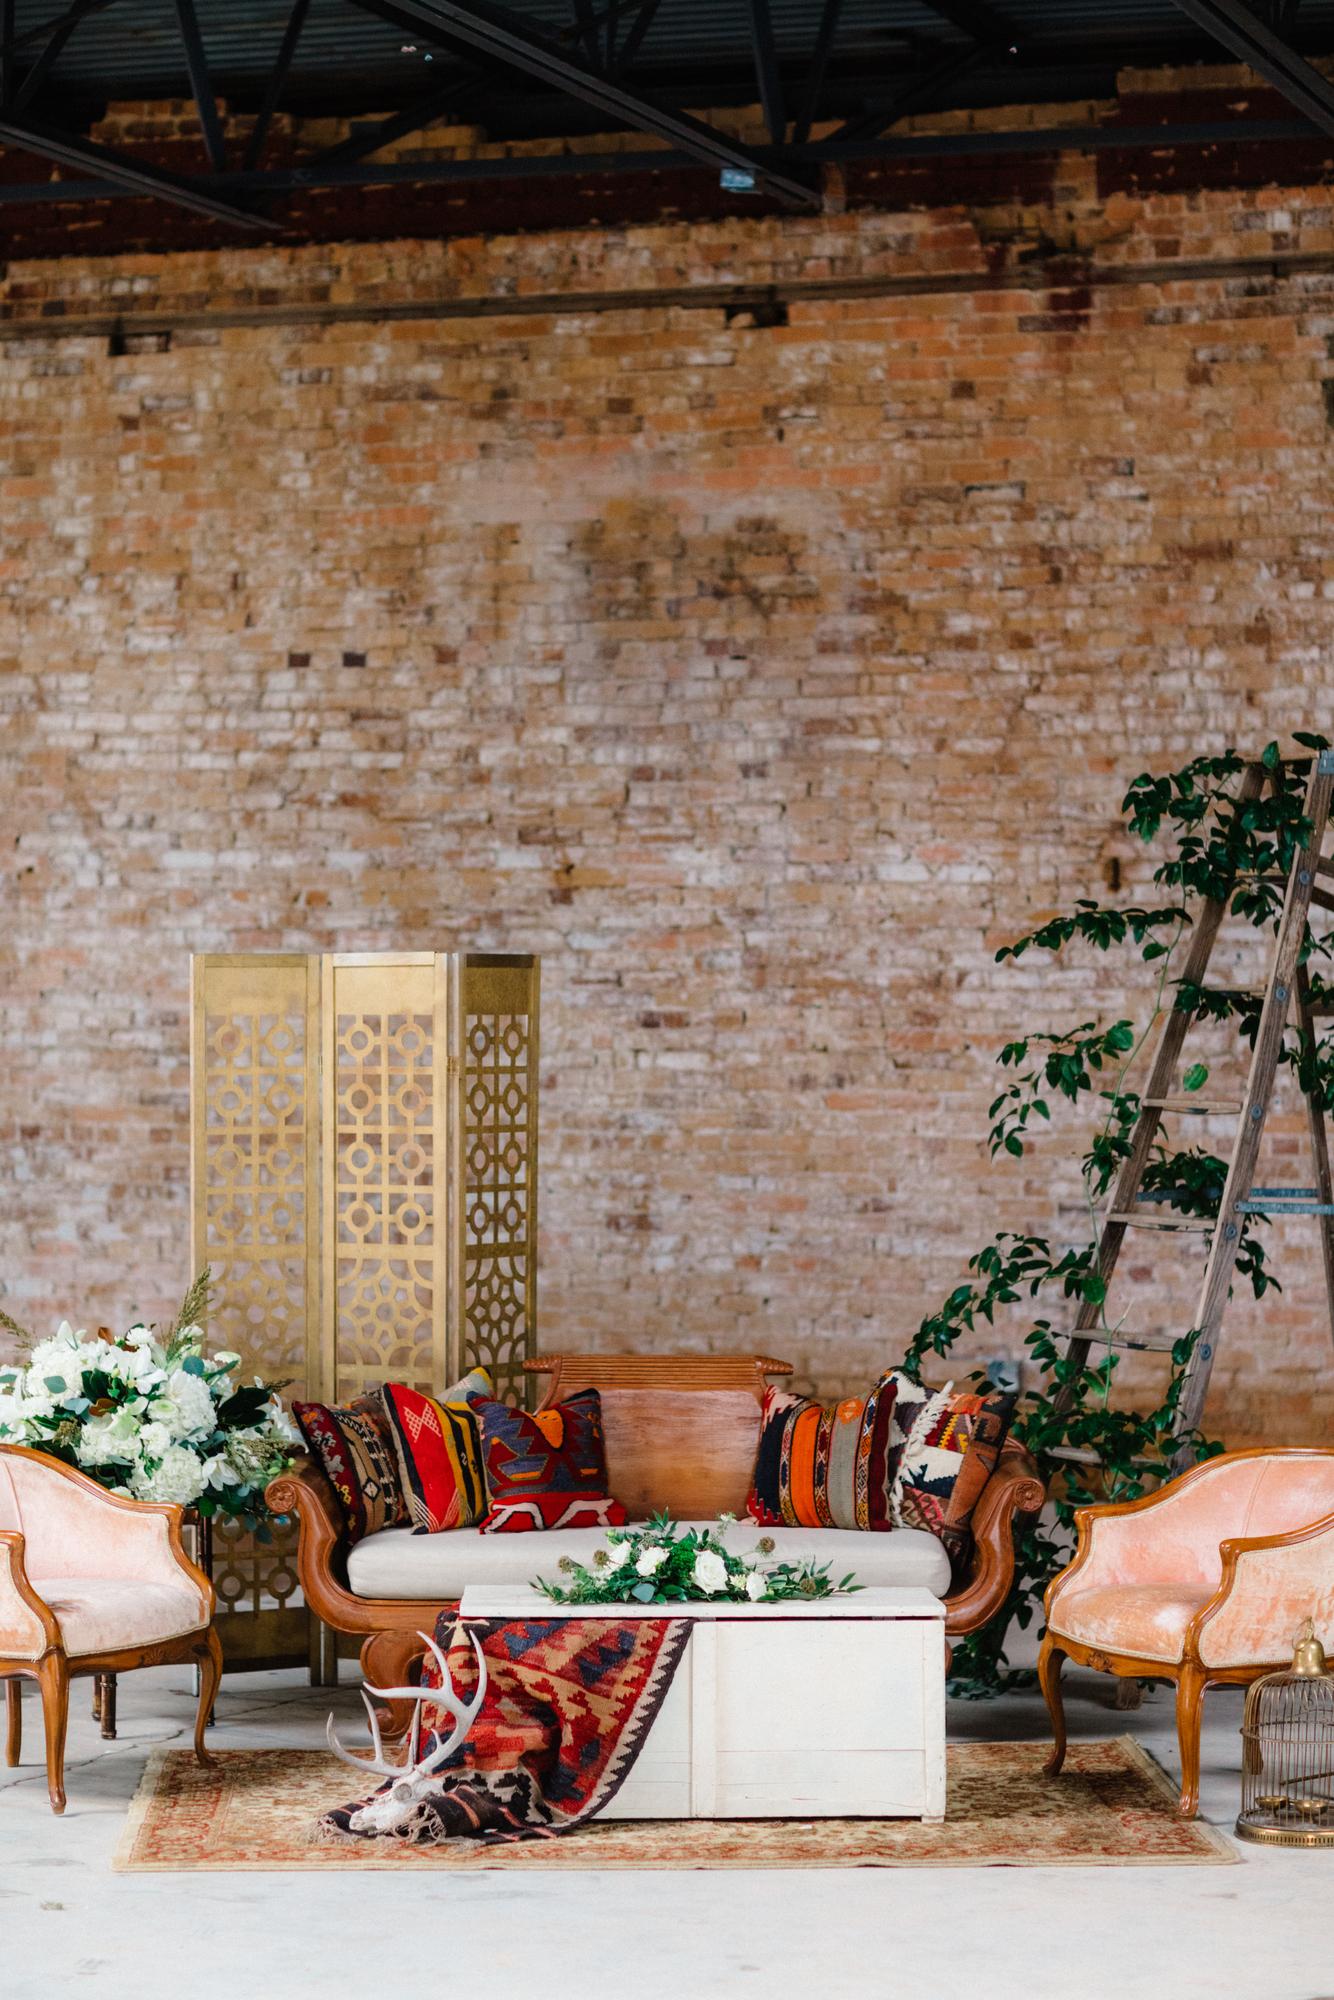 brandon jones photograpy_monroe pearson_rent my dust (11).jpg